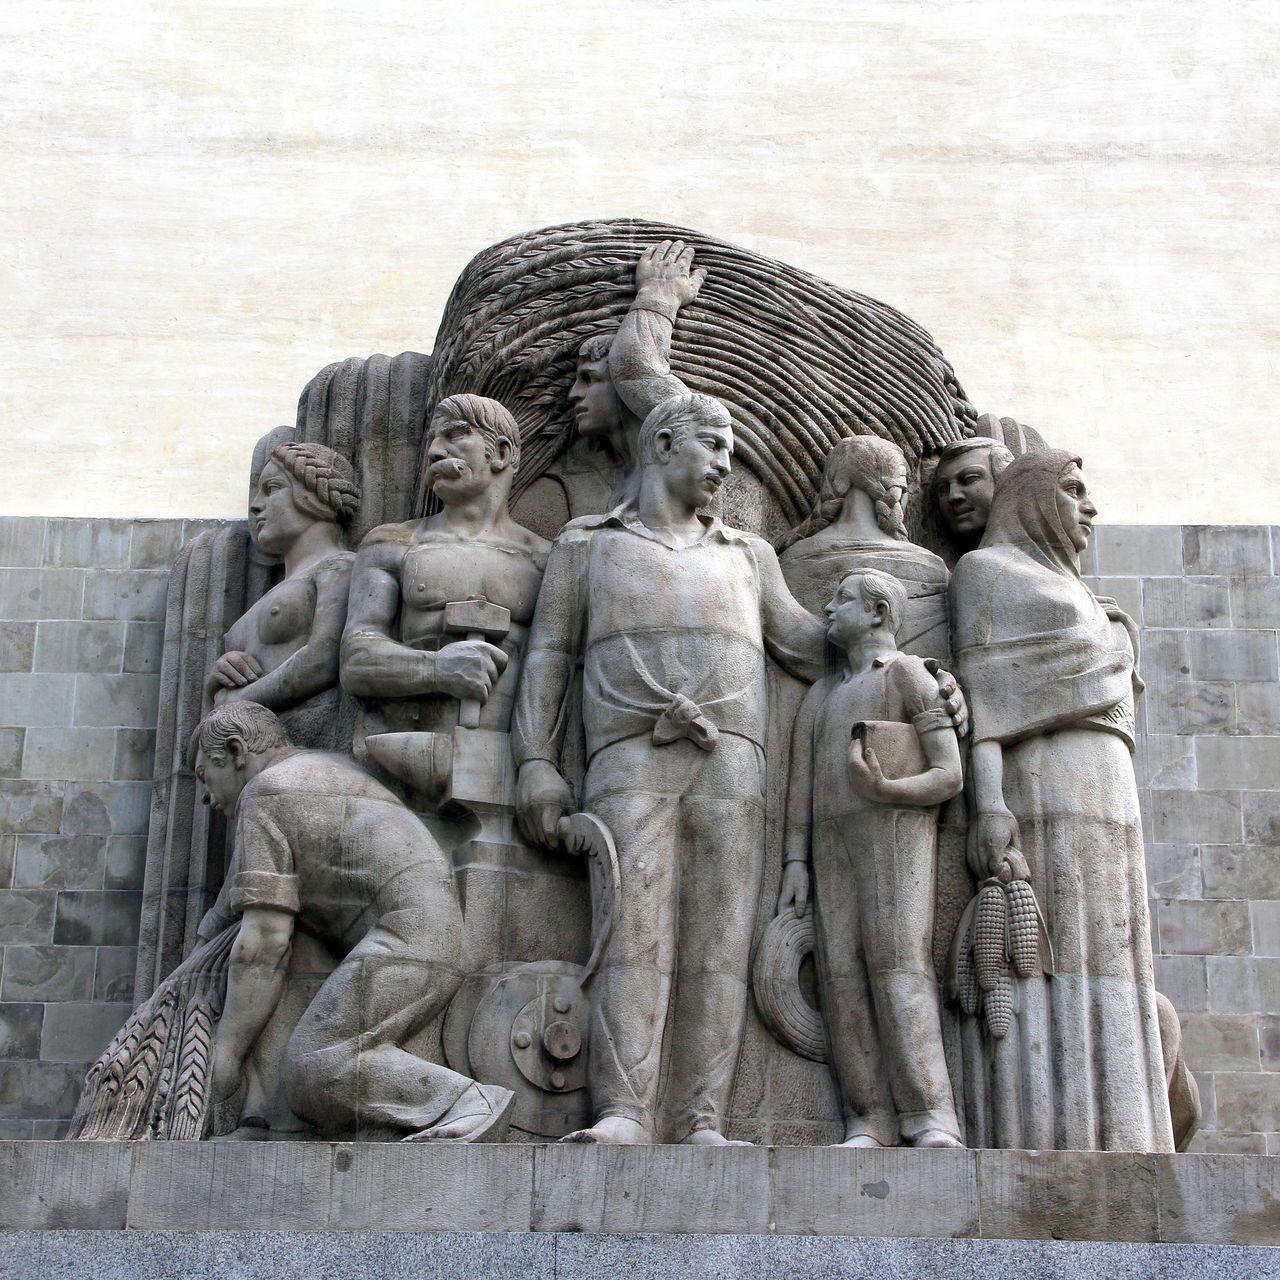 Manumento a Alvaro Obregón, en San Angel, Parque La Bombilla Art Day Monument Outdoors San Angel Sculpture Statue Stone Stone Carving Tourism Tourist Destinations Travel Destinations The Architect - 2016 EyeEm Awards